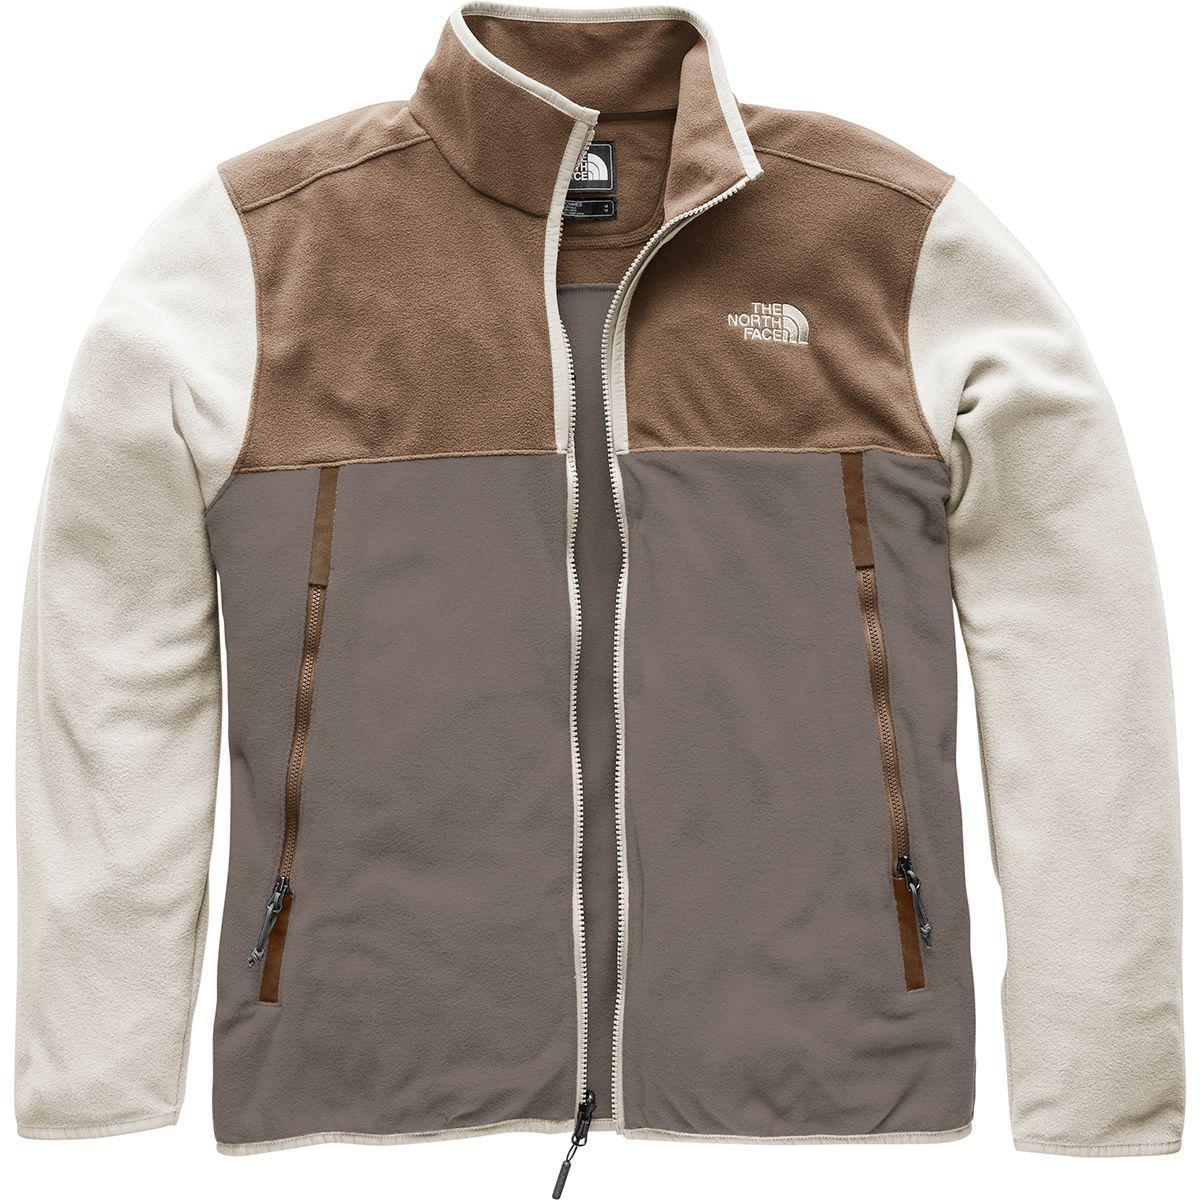 00229feab995 Lyst - The North Face Glacier Alpine Fleece Jacket in Brown for Men